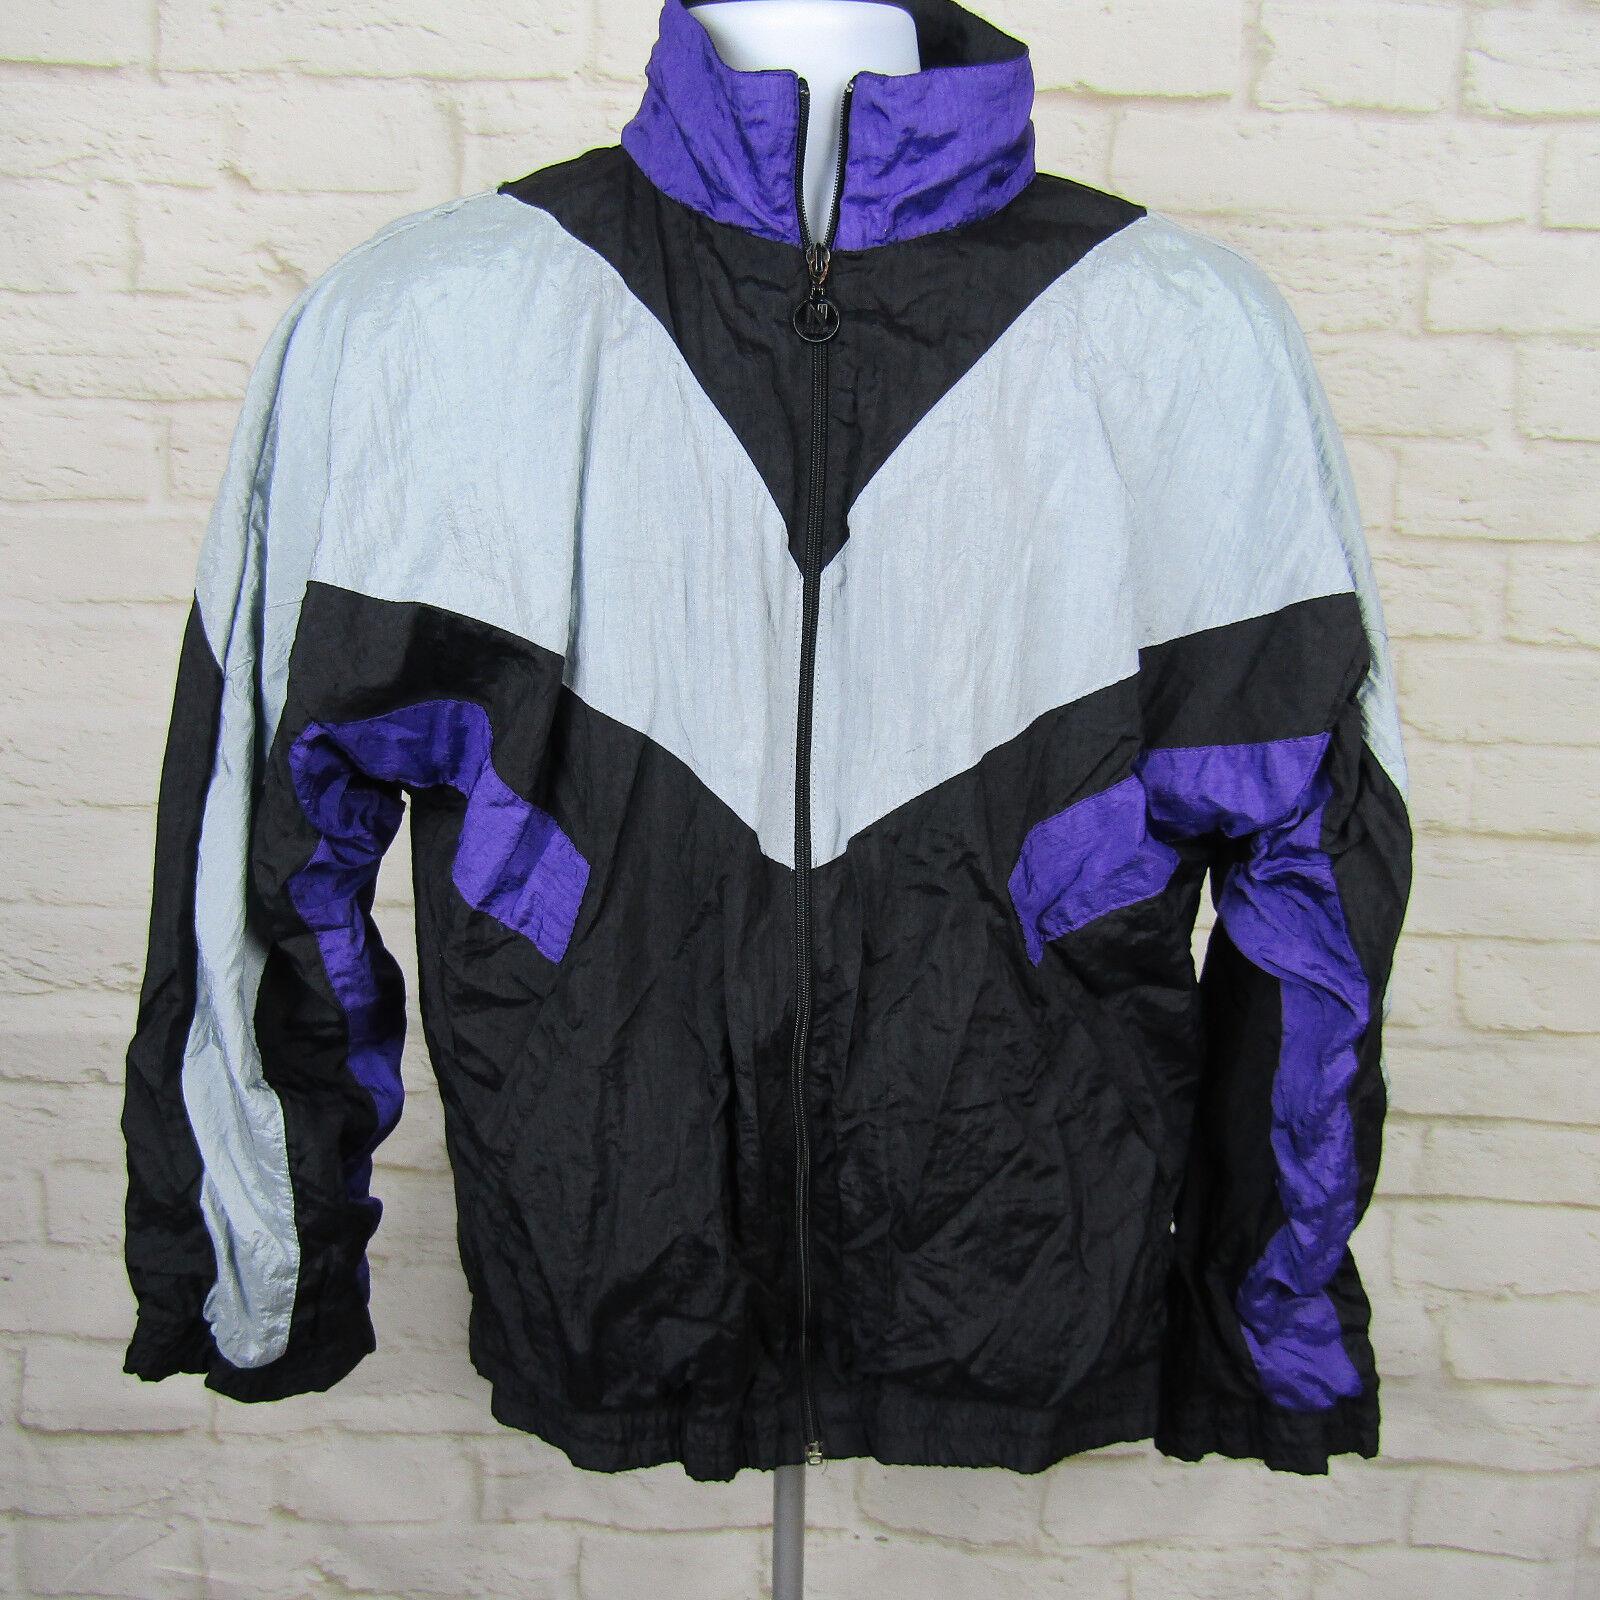 Women's Clothing Frugal Vintage Nike Jacket Women Medium Windbreaker Zip Up Activewear